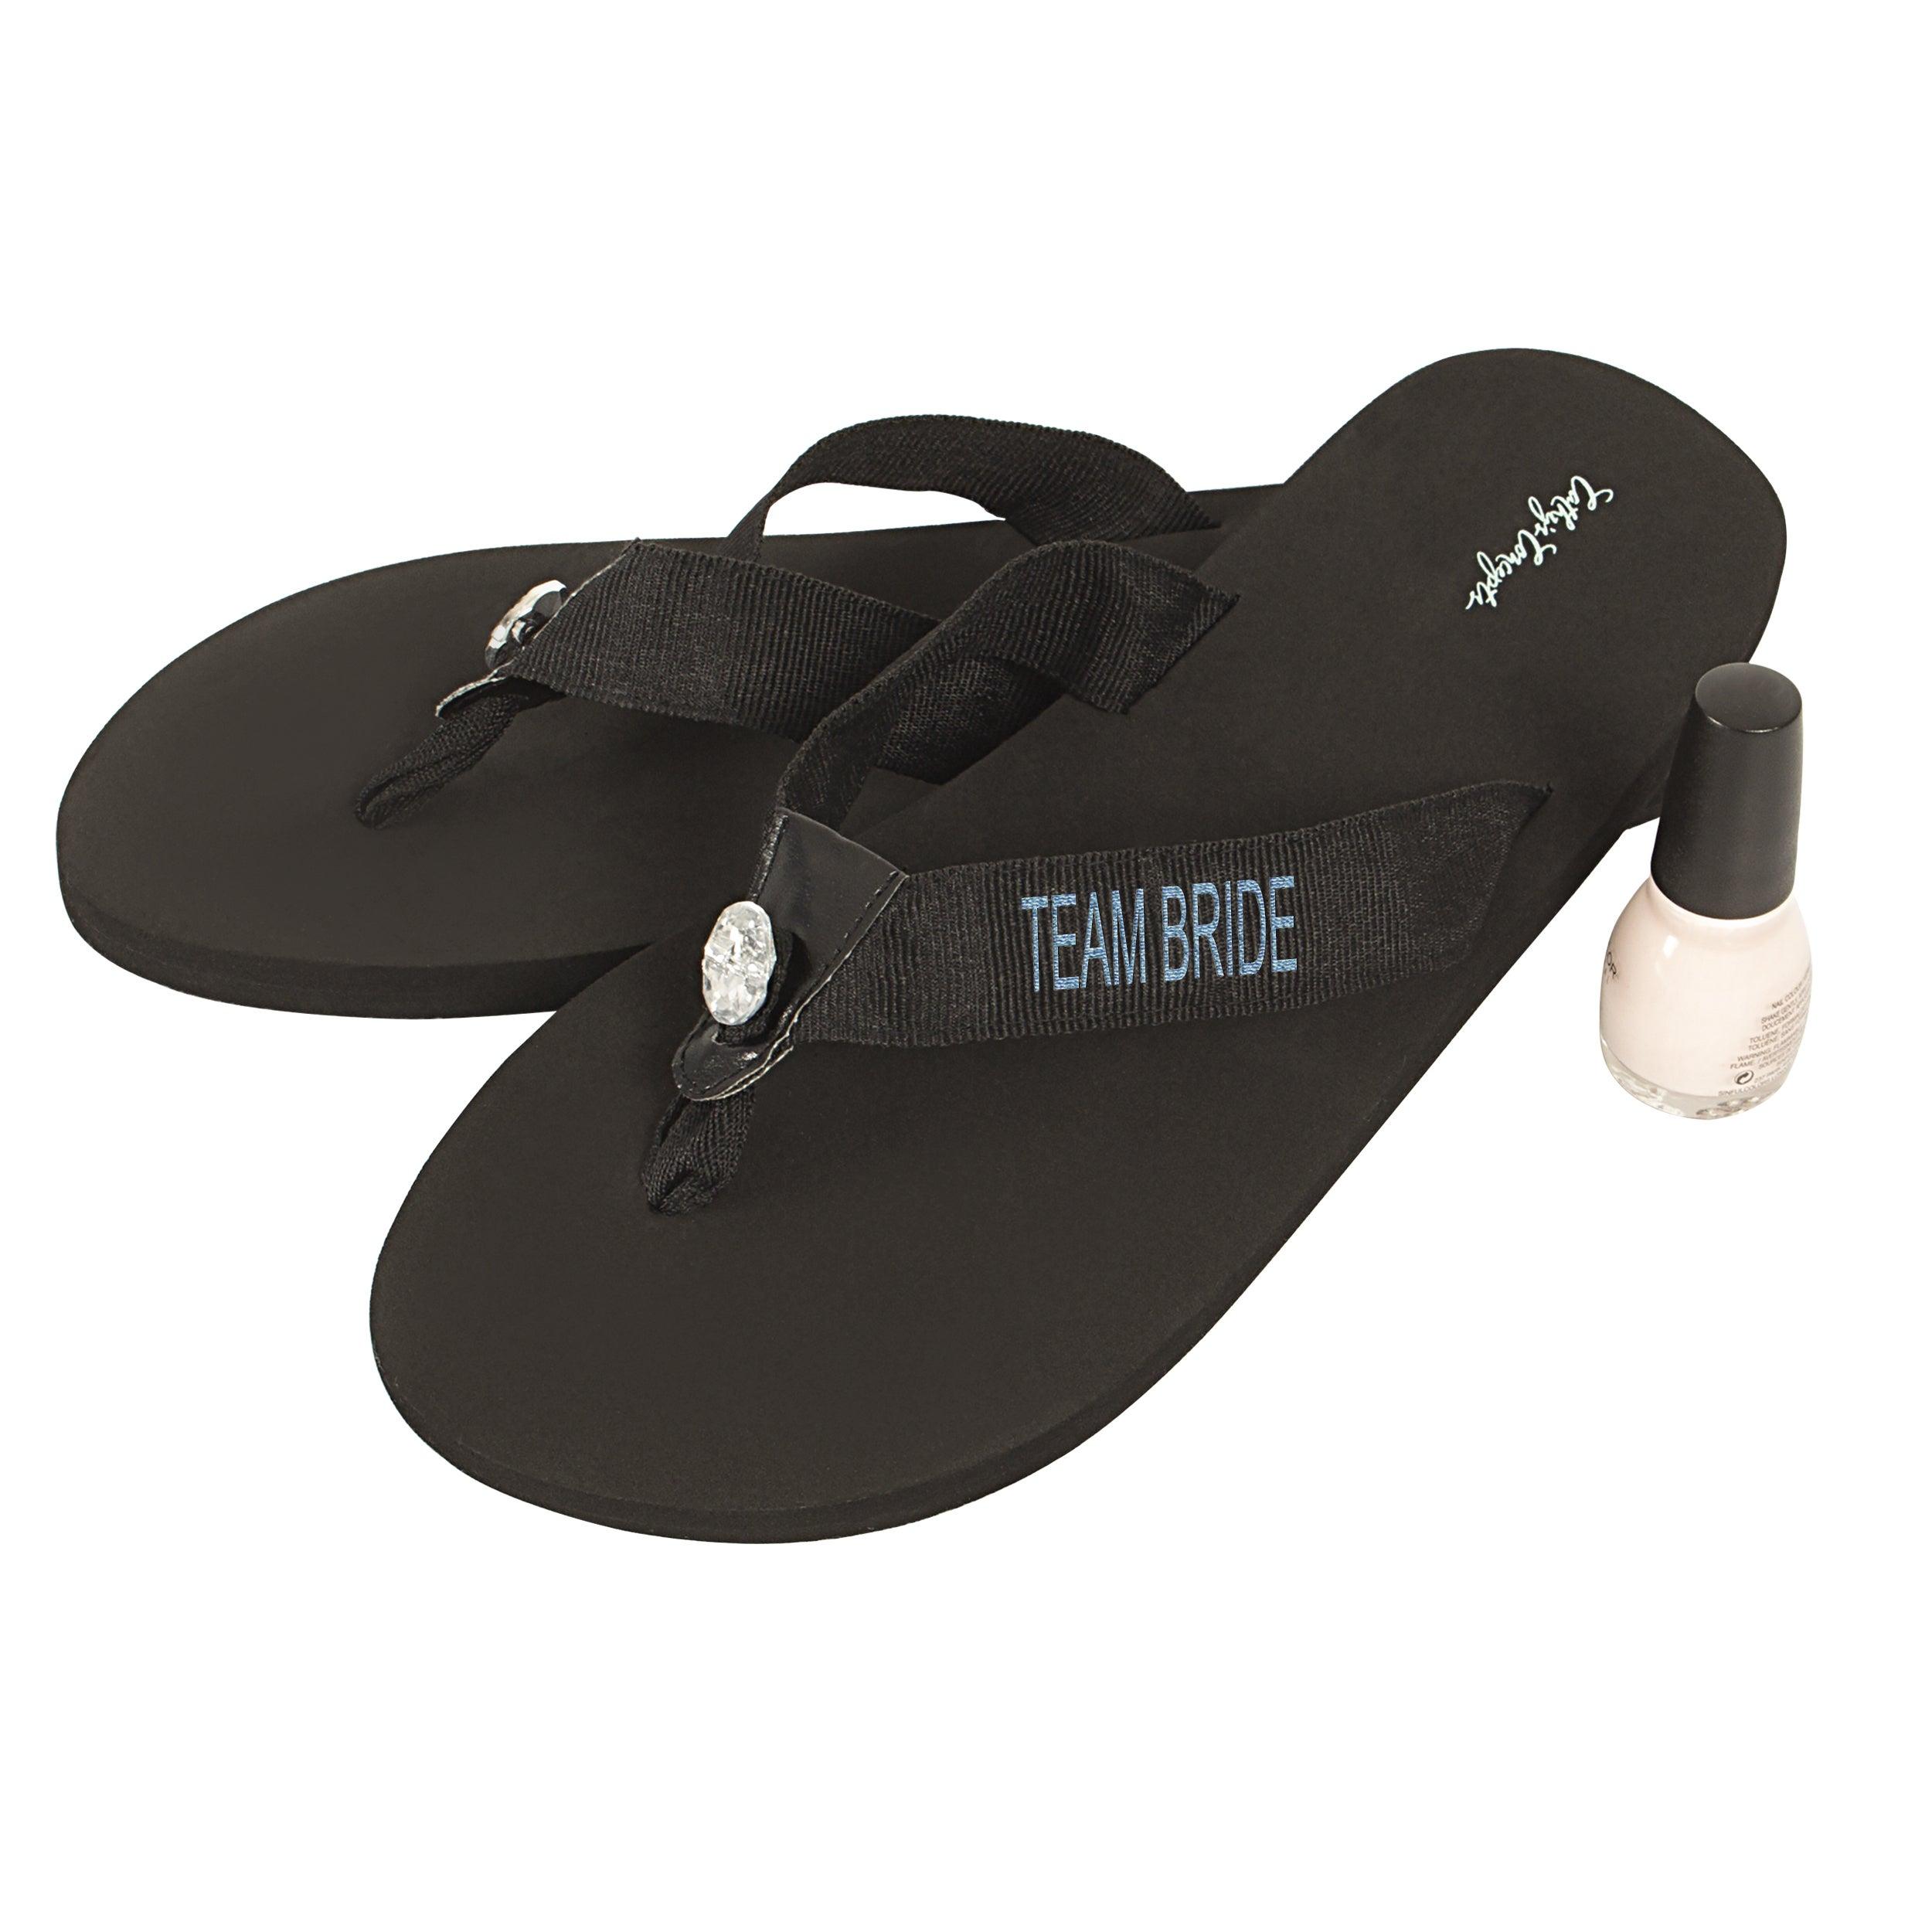 bdacdefa3aa44 Shop Team Bride Black Flip Flops - Free Shipping On Orders Over  45 -  Overstock - 16818509